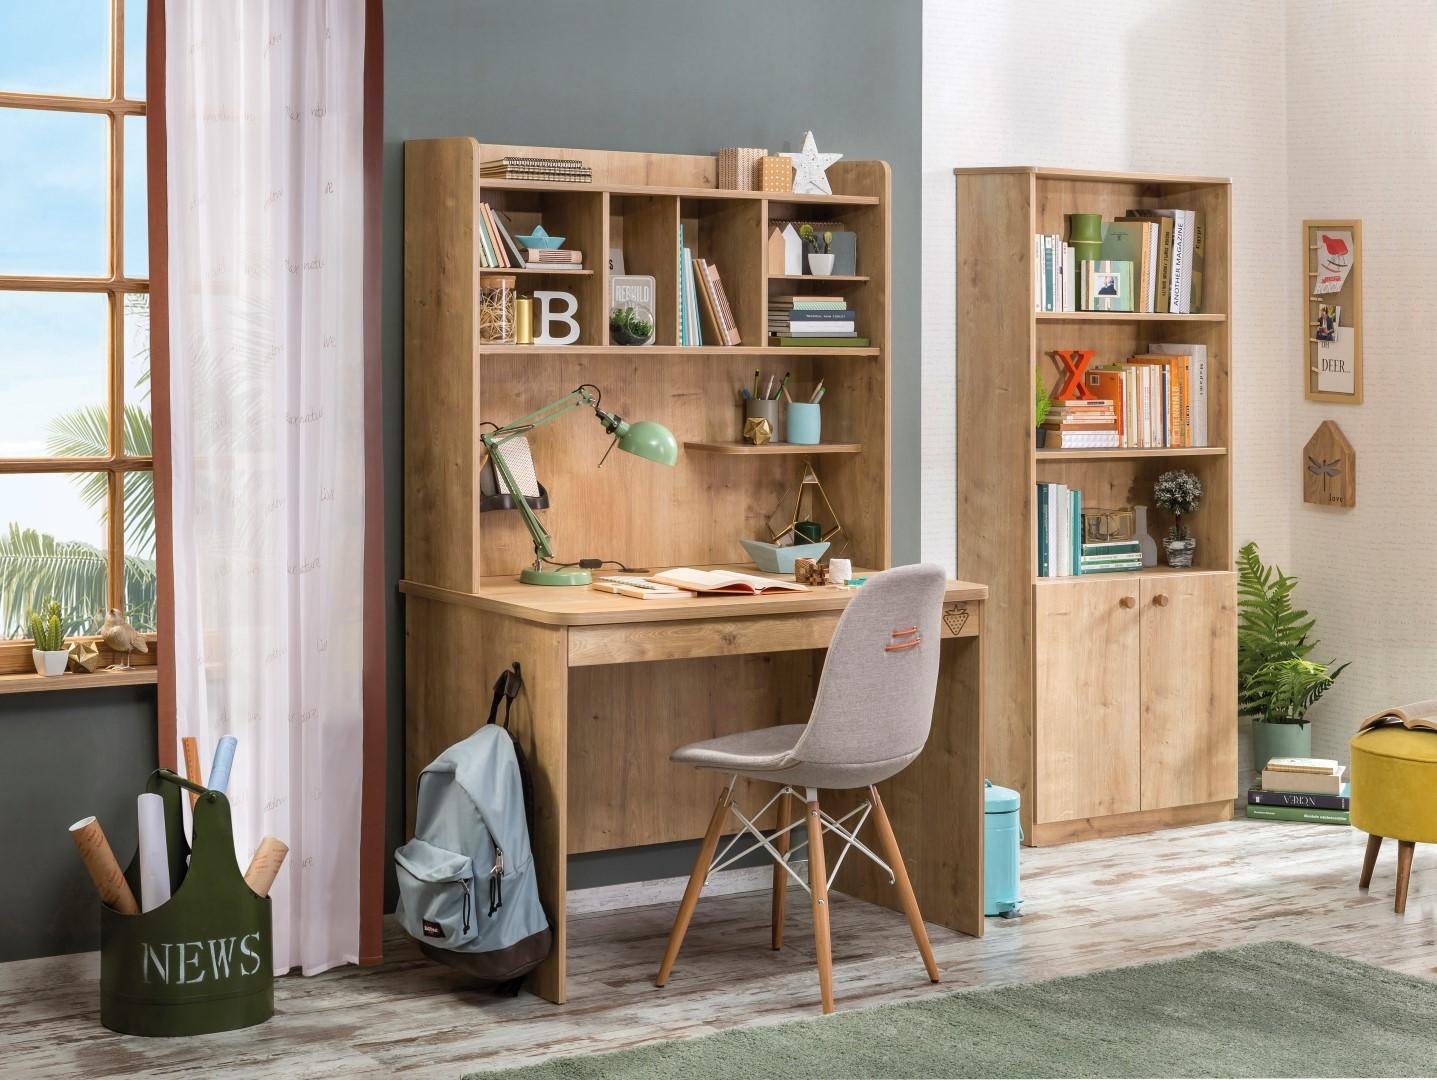 Kinderkamer Met Bureau : Stockholm kinderkamer bureau jongenskamer specialist in